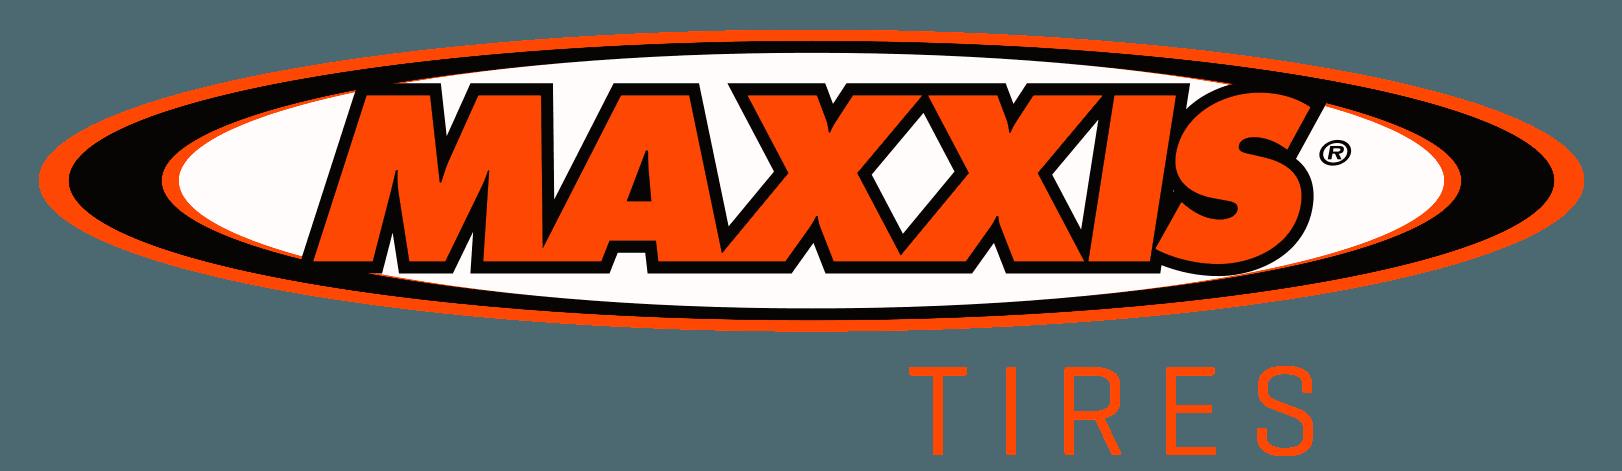 Maxxis thumbnail